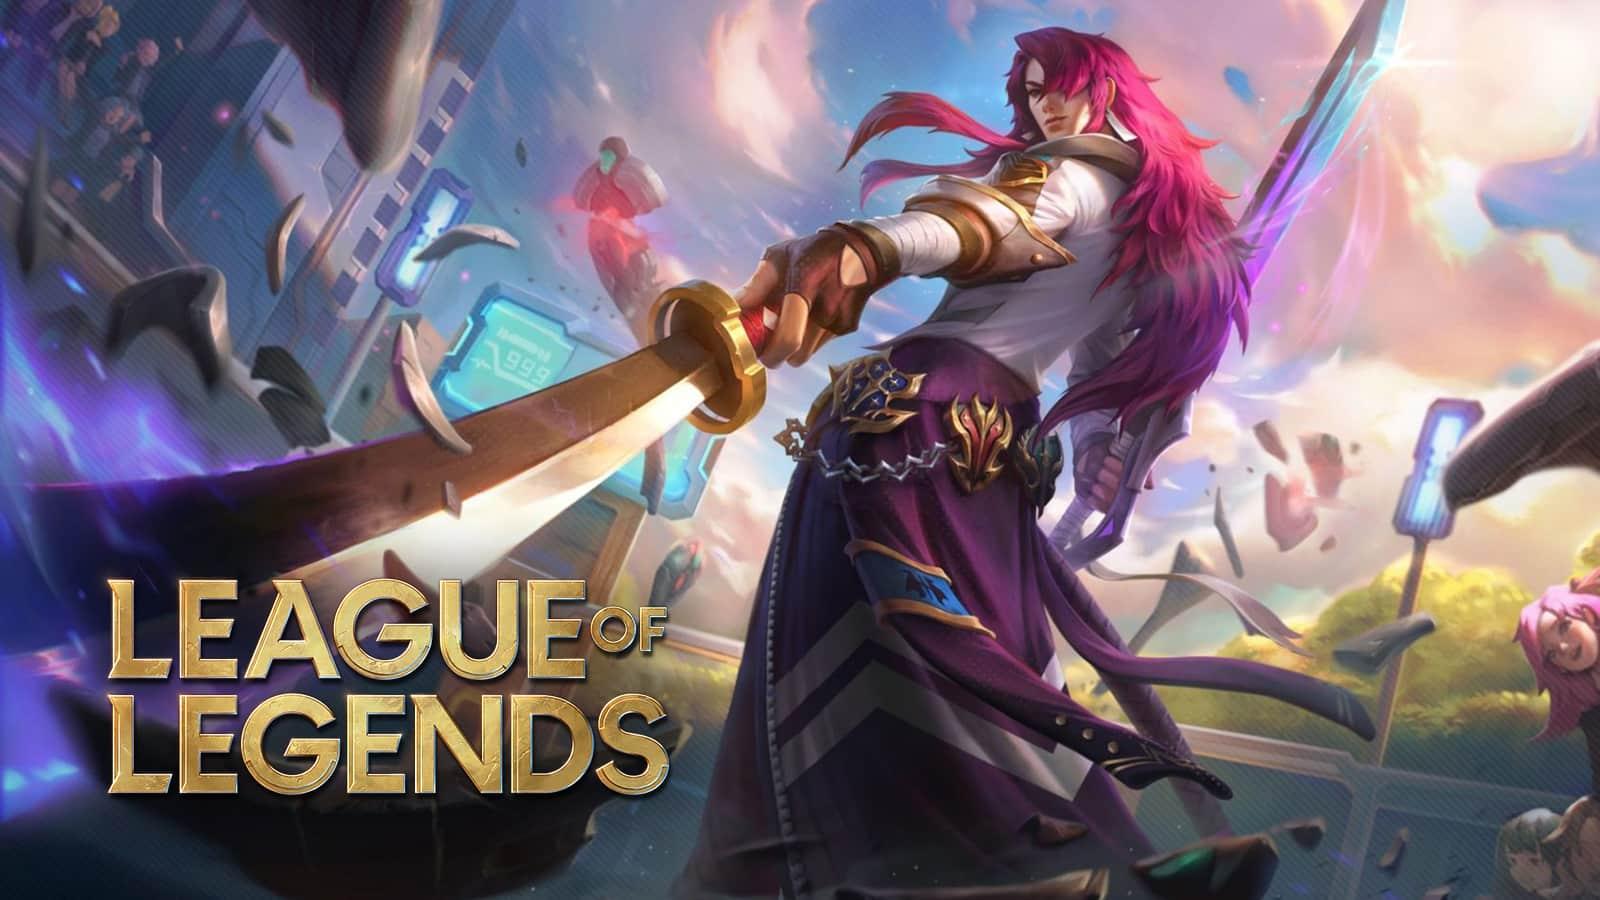 Battle Academia Yone in league of legends